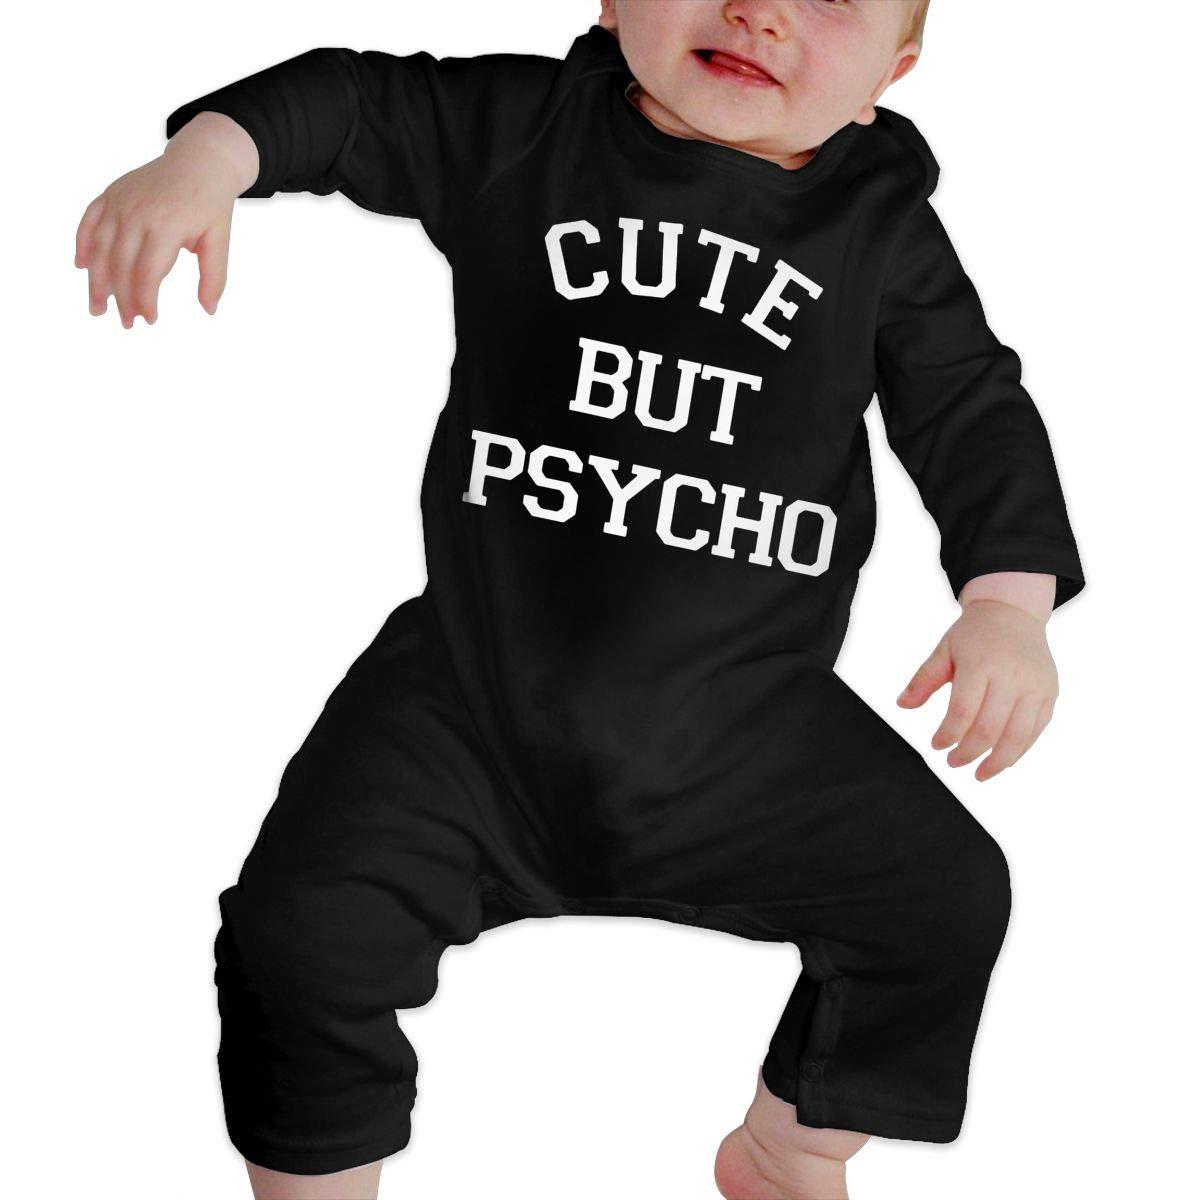 U99oi-9 Long Sleeve Cotton Bodysuit for Baby Boys and Girls Soft Cute But Psycho Sleepwear